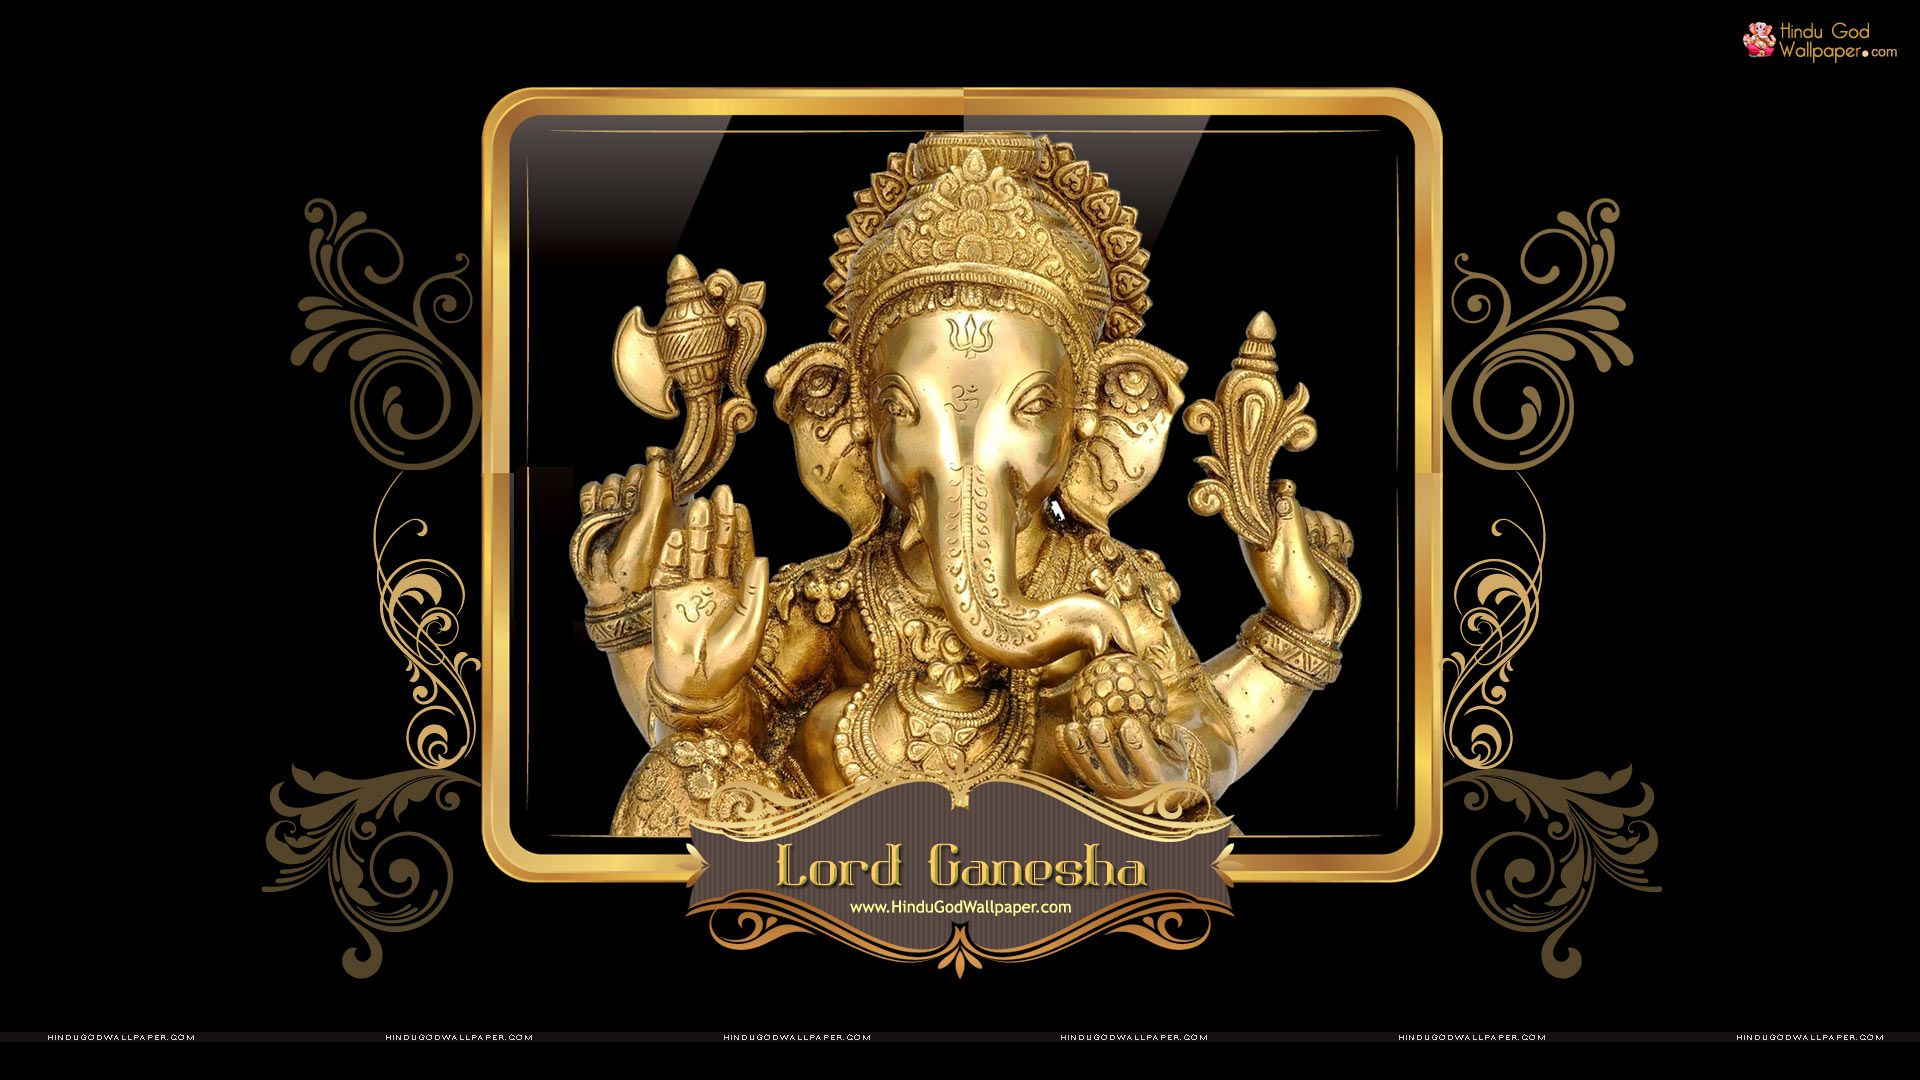 Lord Krishna 3d Live Wallpaper Lord Ganesha Wallpaper 1080p Hd High Resolution Download